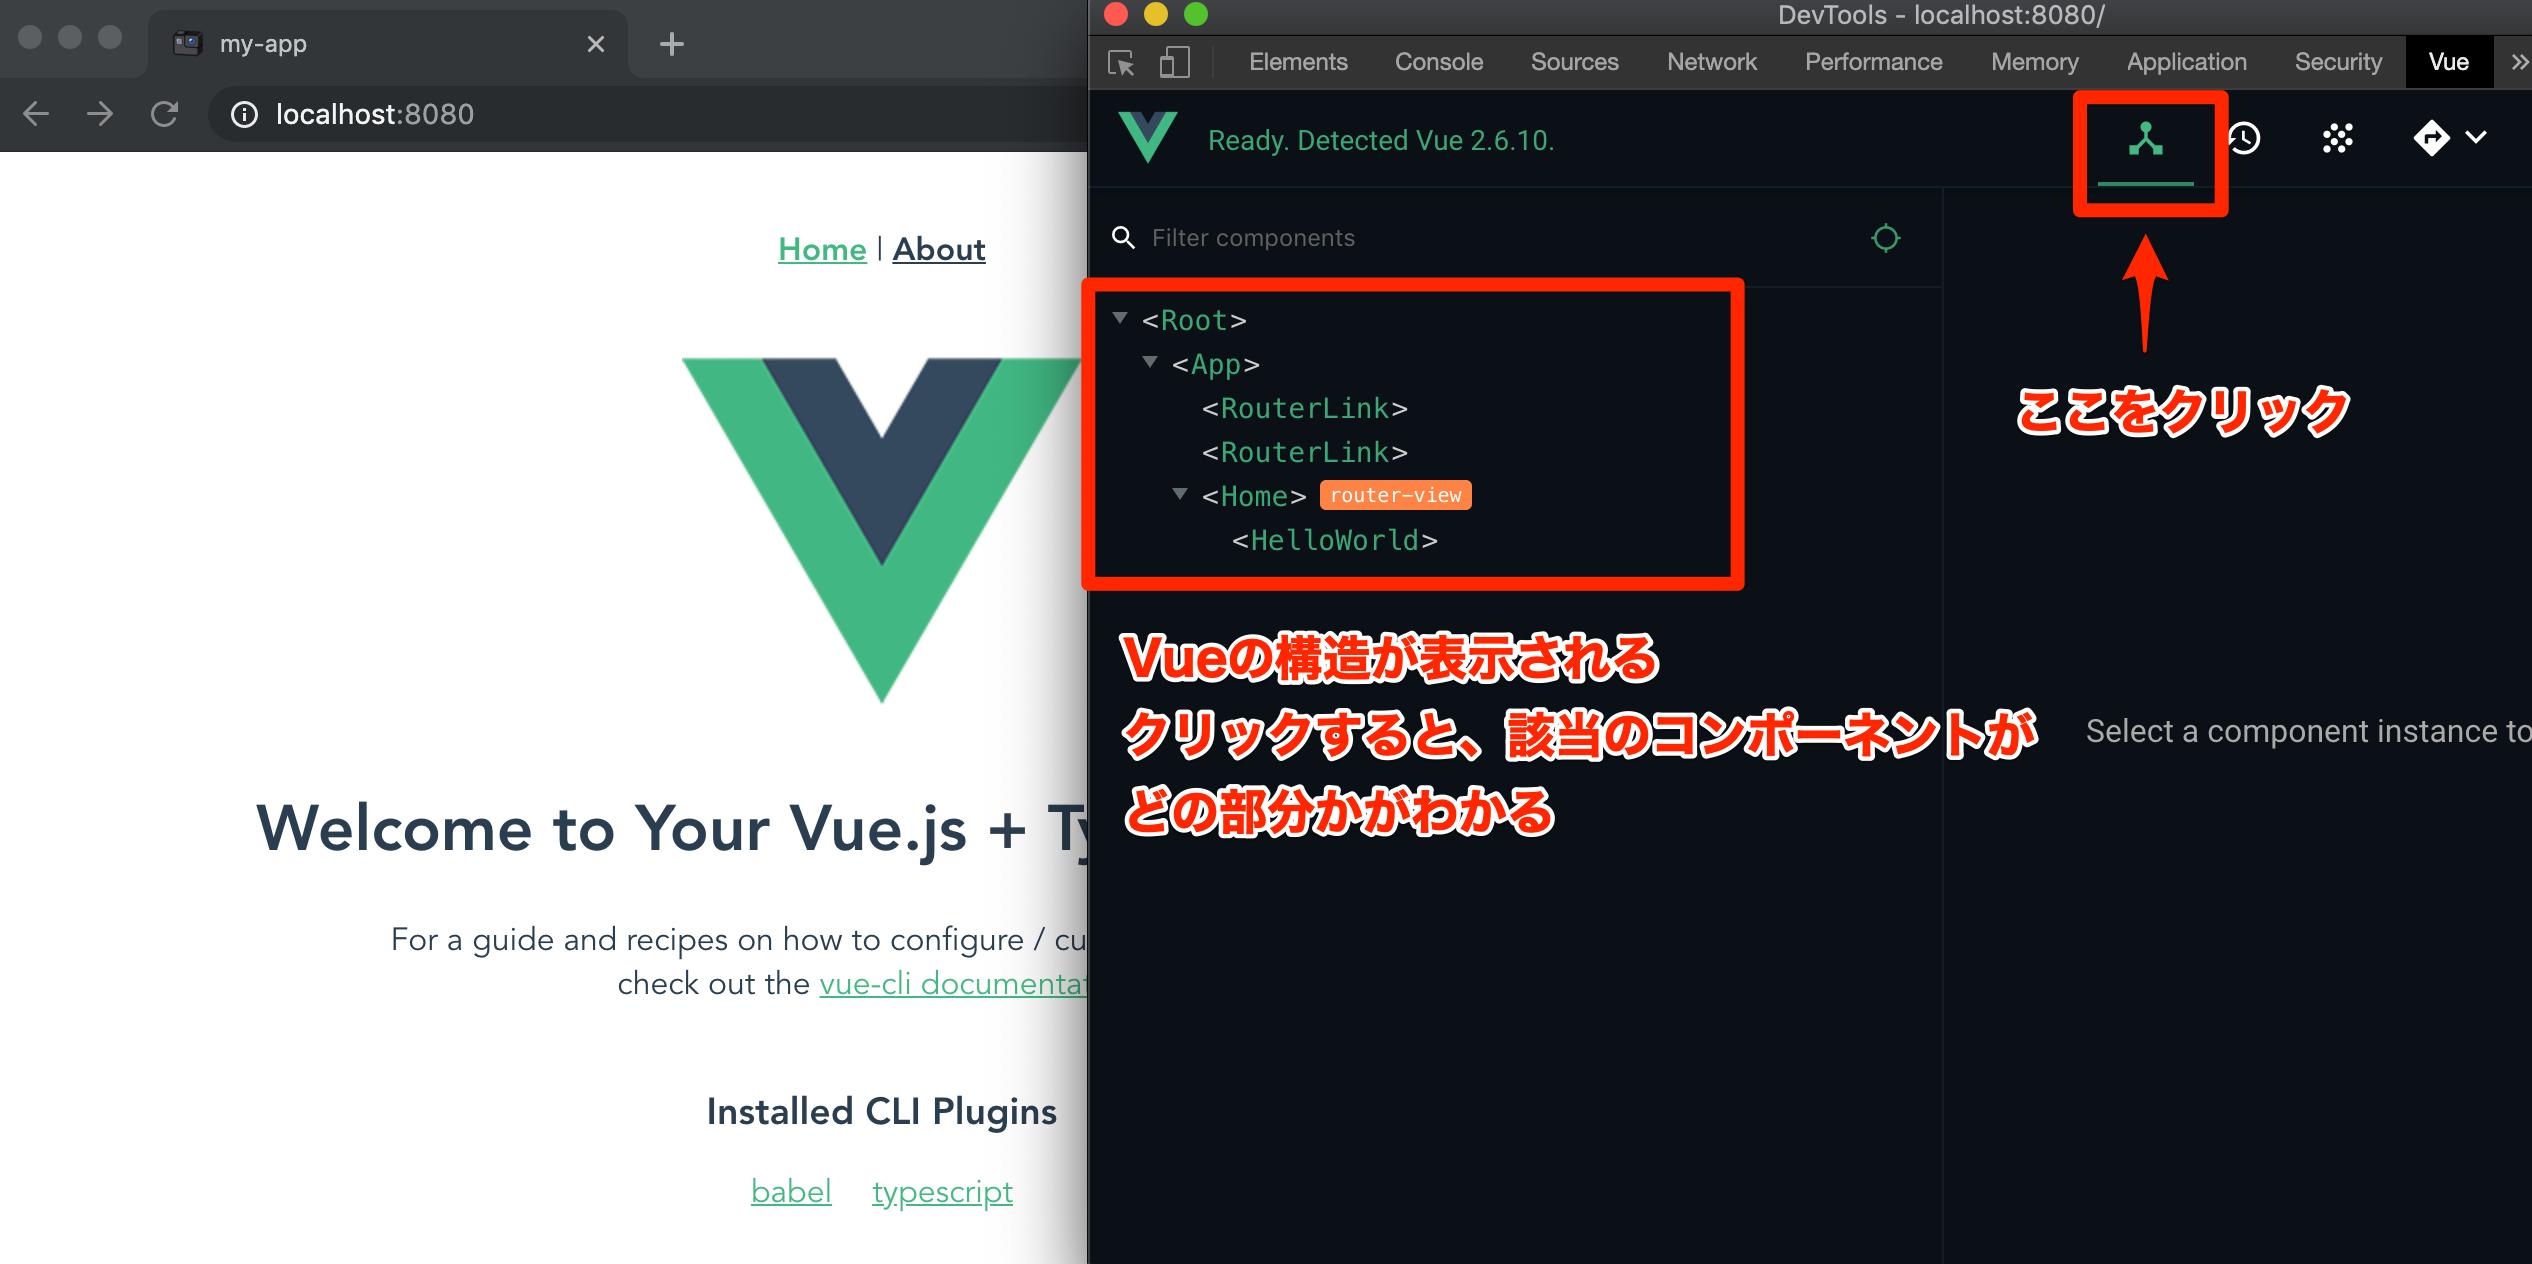 DevTools_-_localhost_8080__と_my-app.png